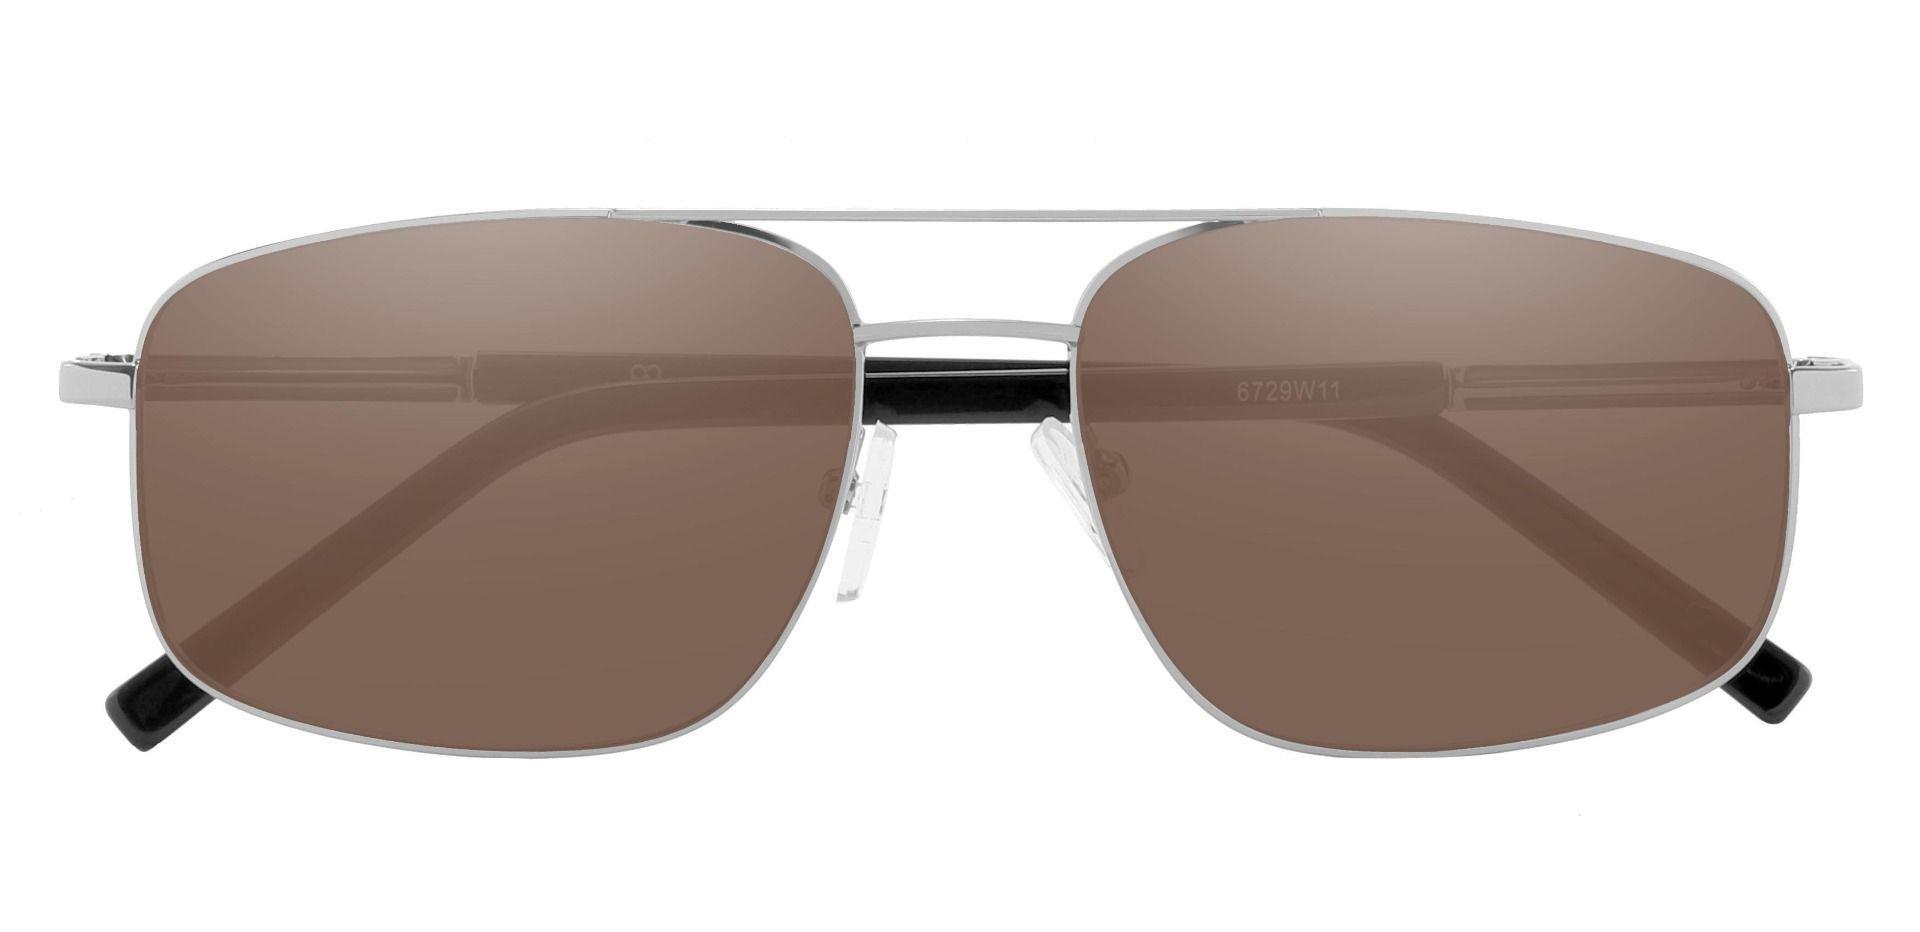 Davenport Aviator Prescription Sunglasses - Silver Frame With Brown Lenses